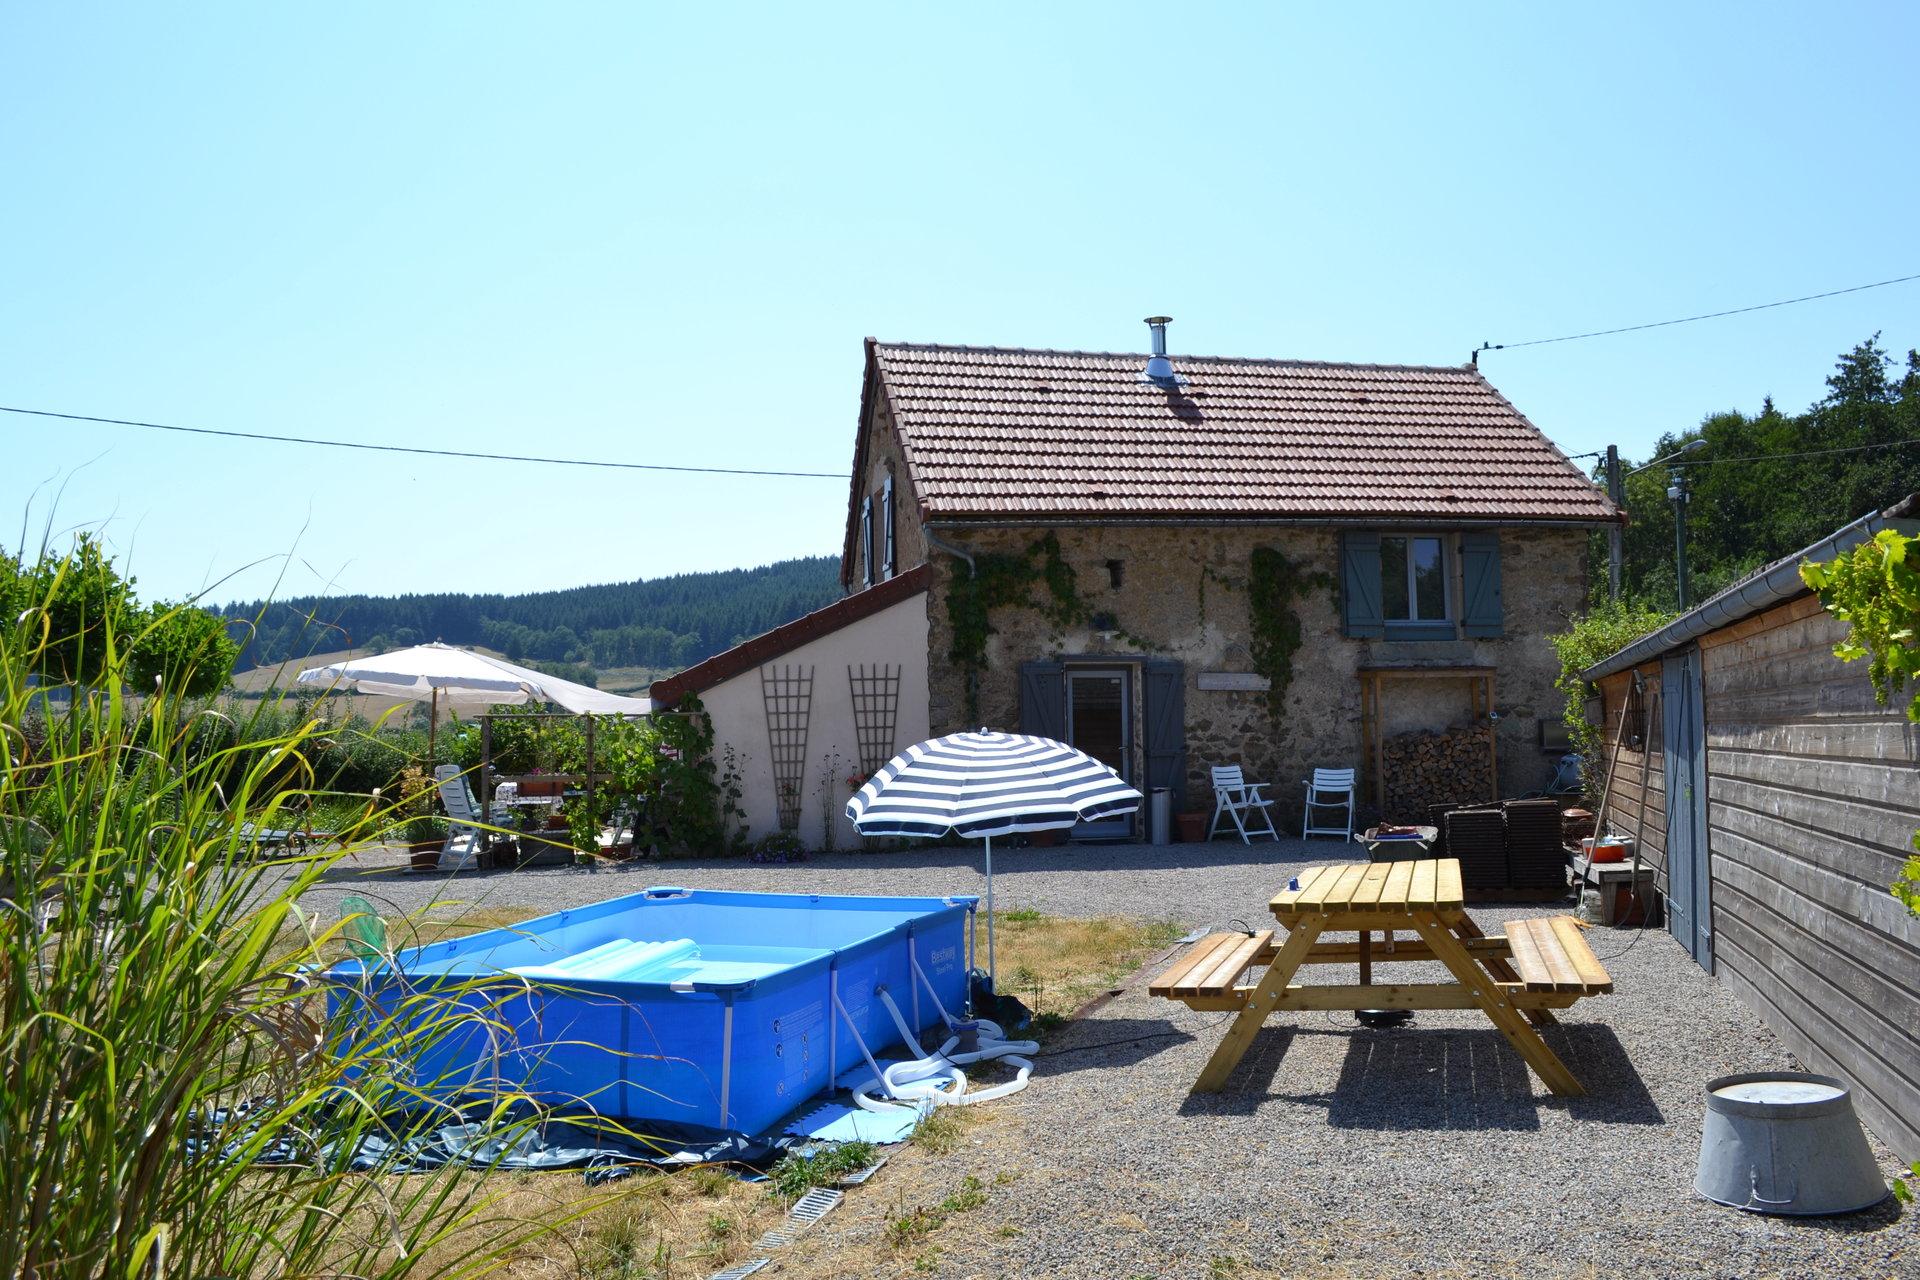 Knus woonhuis te koop nabij Lucenay L'évêque, Morvan